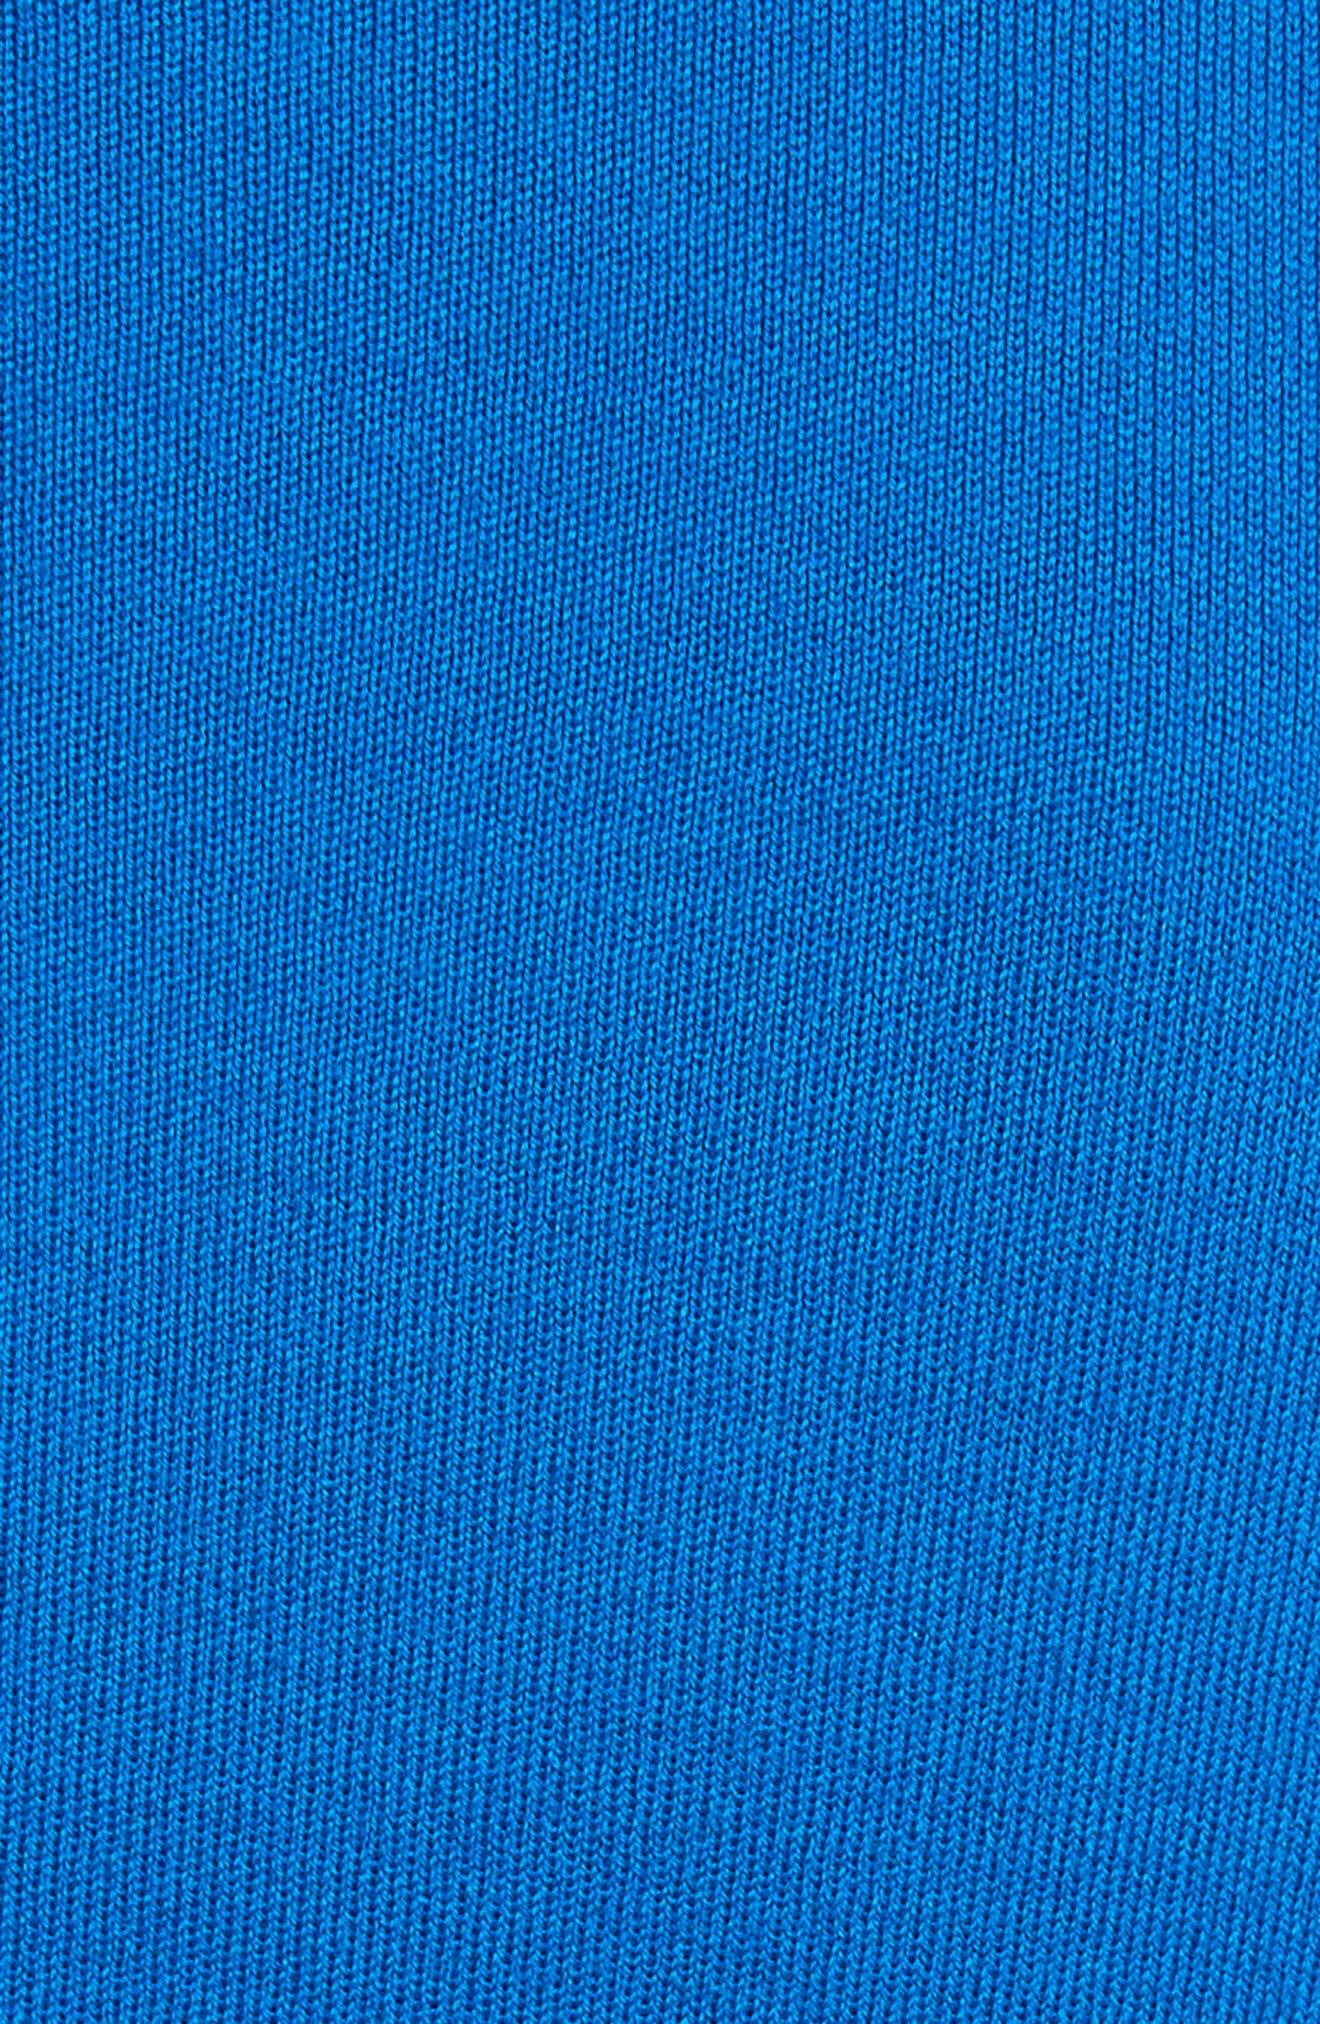 Merino Wool Shrug,                             Alternate thumbnail 5, color,                             Mediterranean